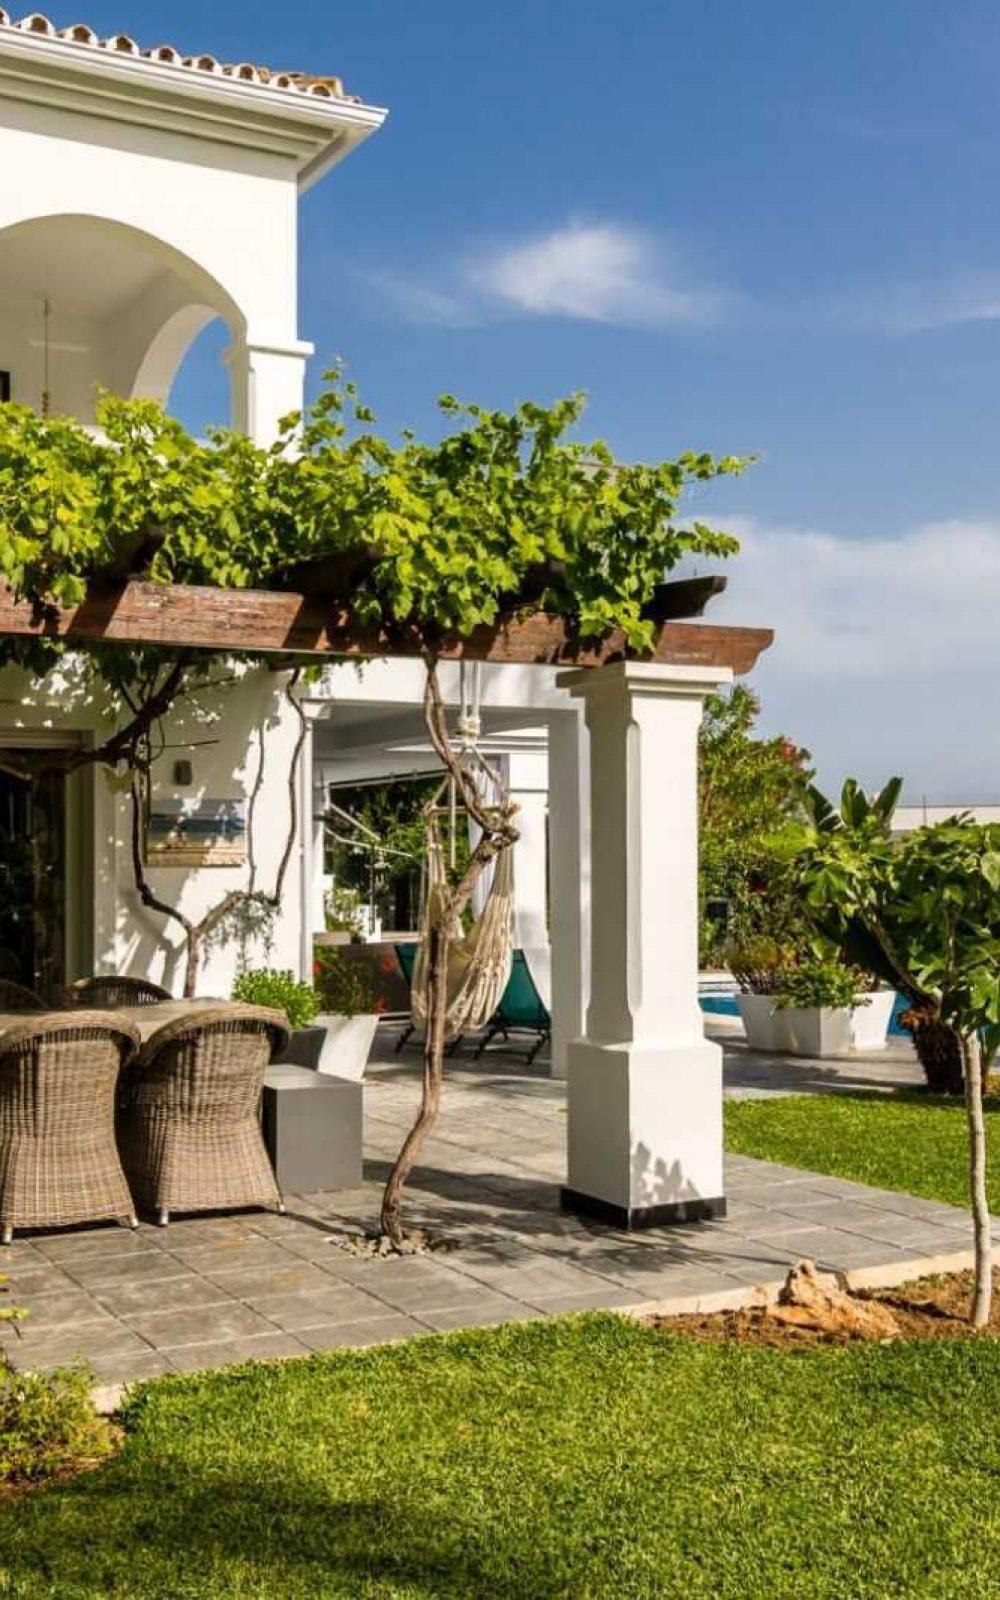 2017.06.01 - Just Rent Marbella - Villa Marlin - (5 of 6) (Large)